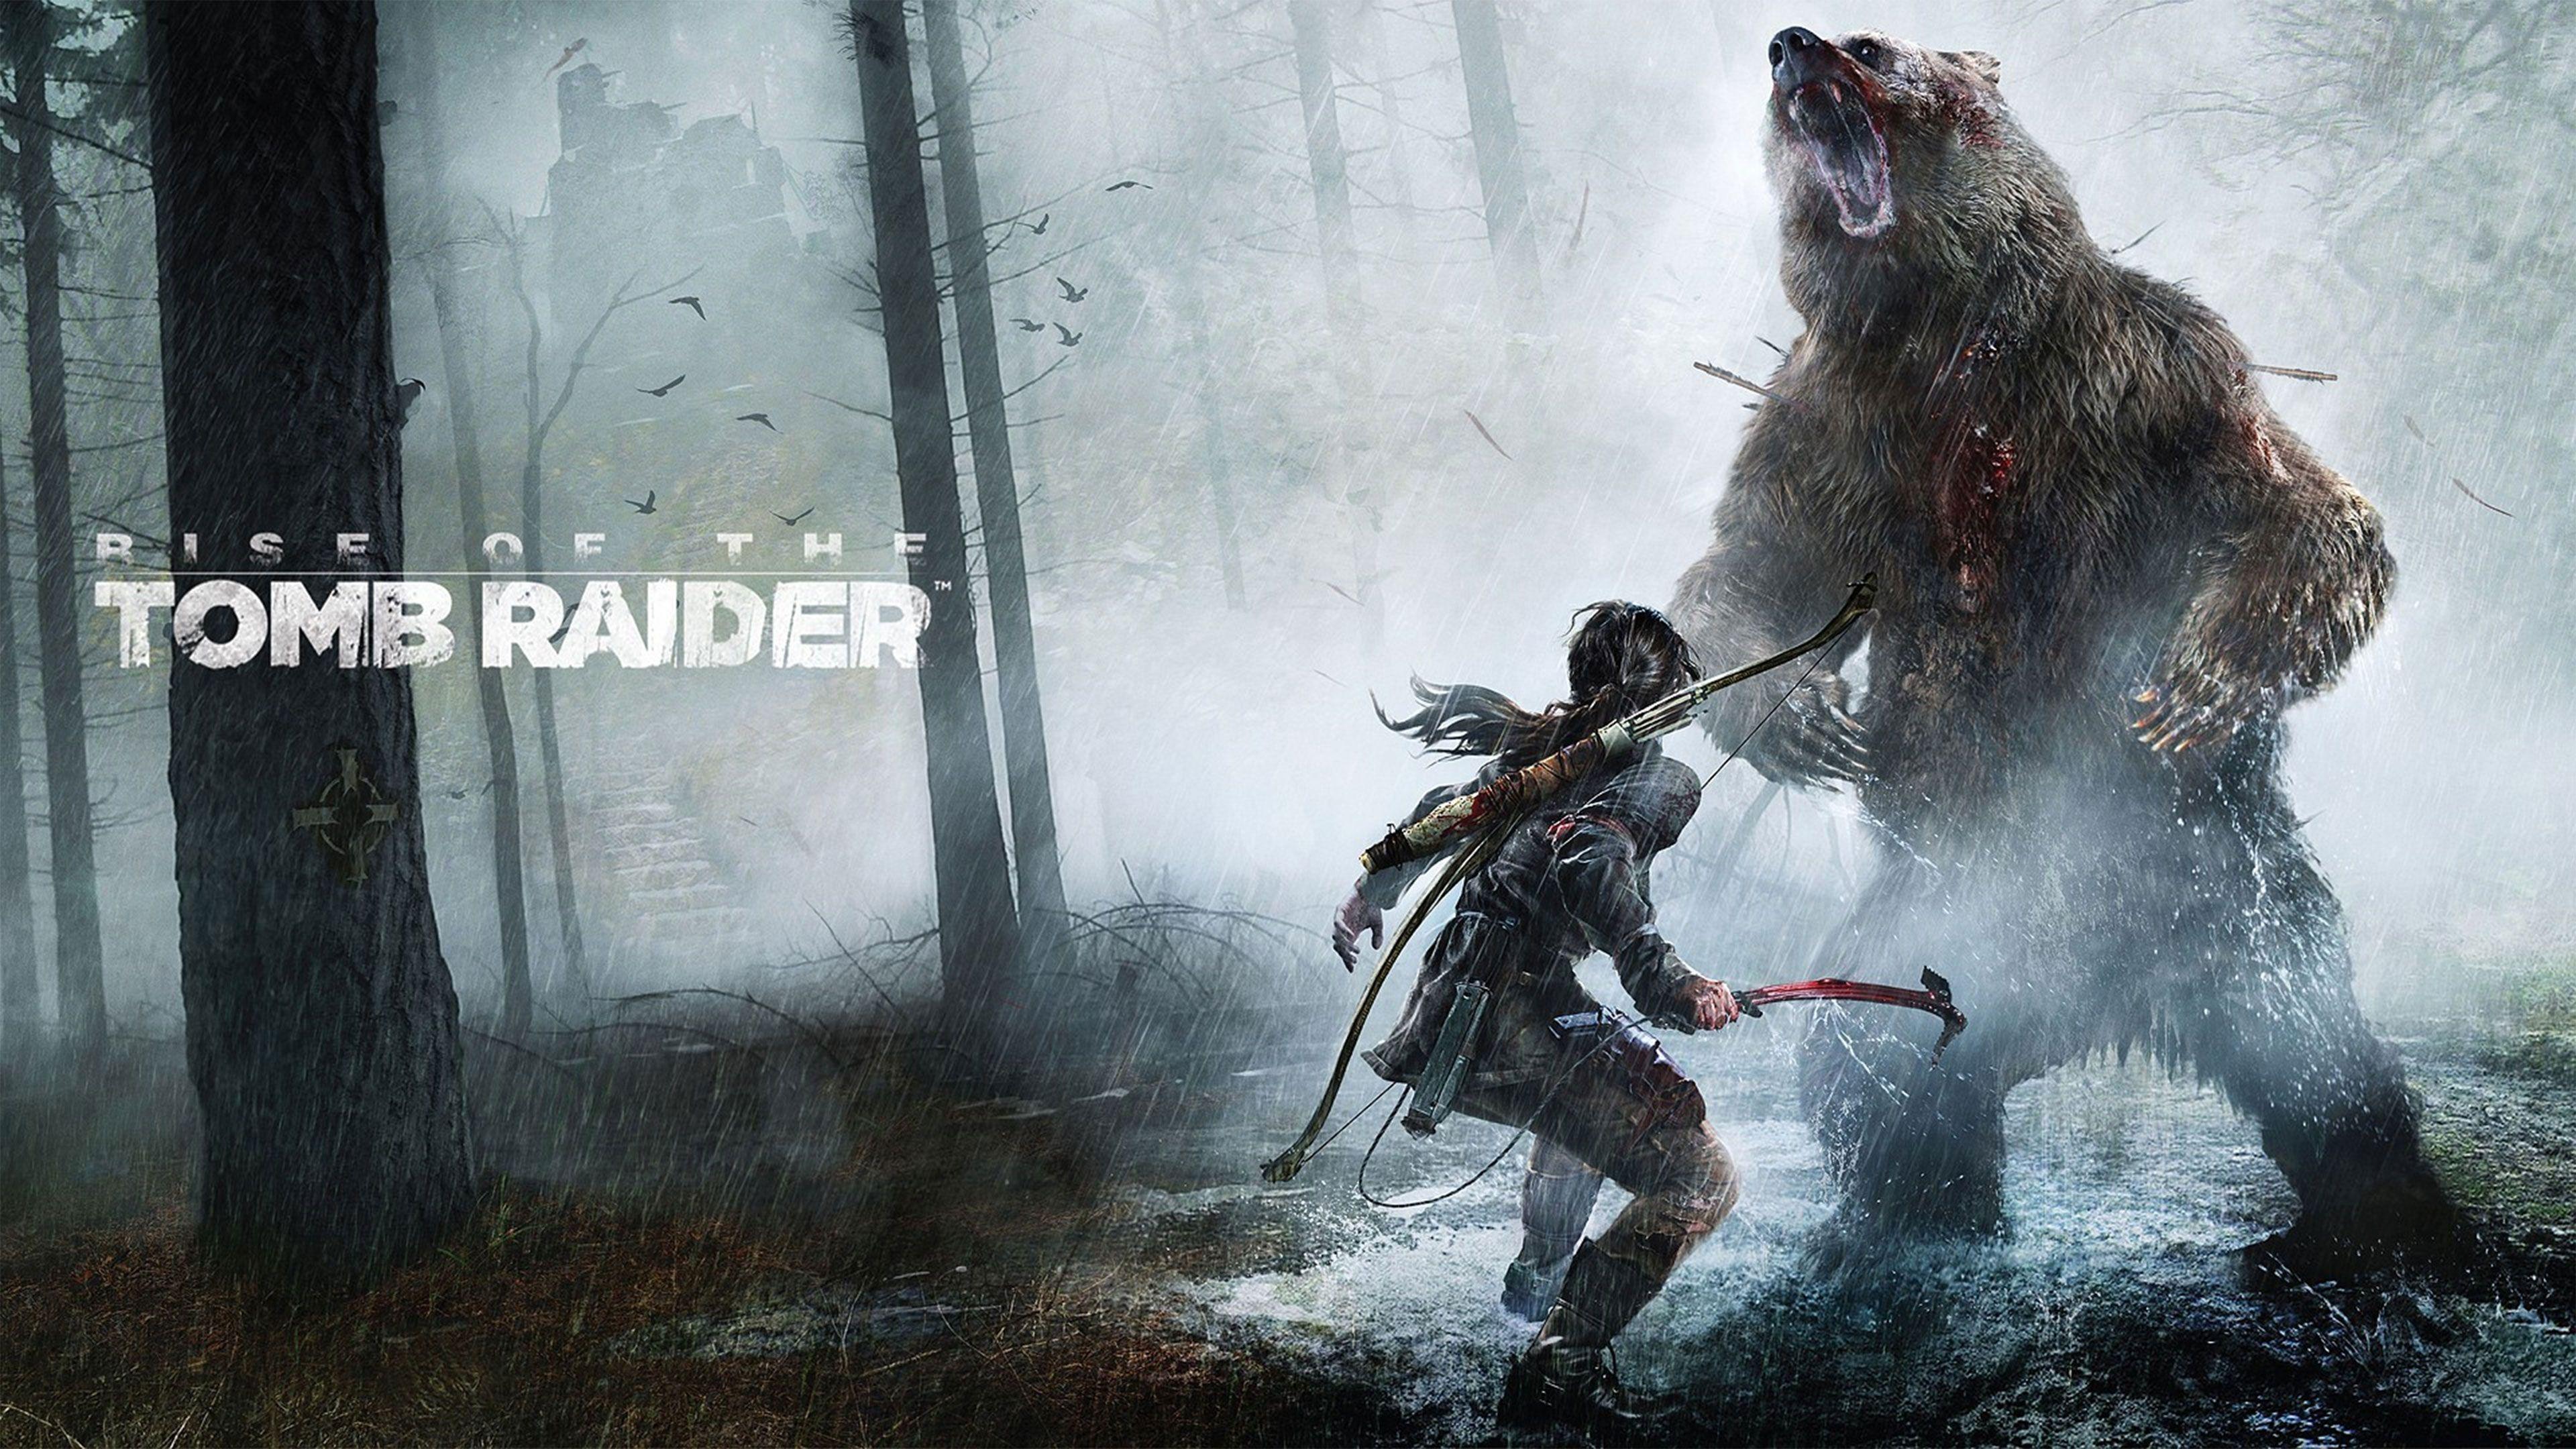 Http Gameranx Com Wp Content Uploads 2016 03 Rise Of The Tomb Raider 4k Wallpaper 1 Jpg Tomb Raider Wallpaper Tomb Raider Pc Tomb Raider